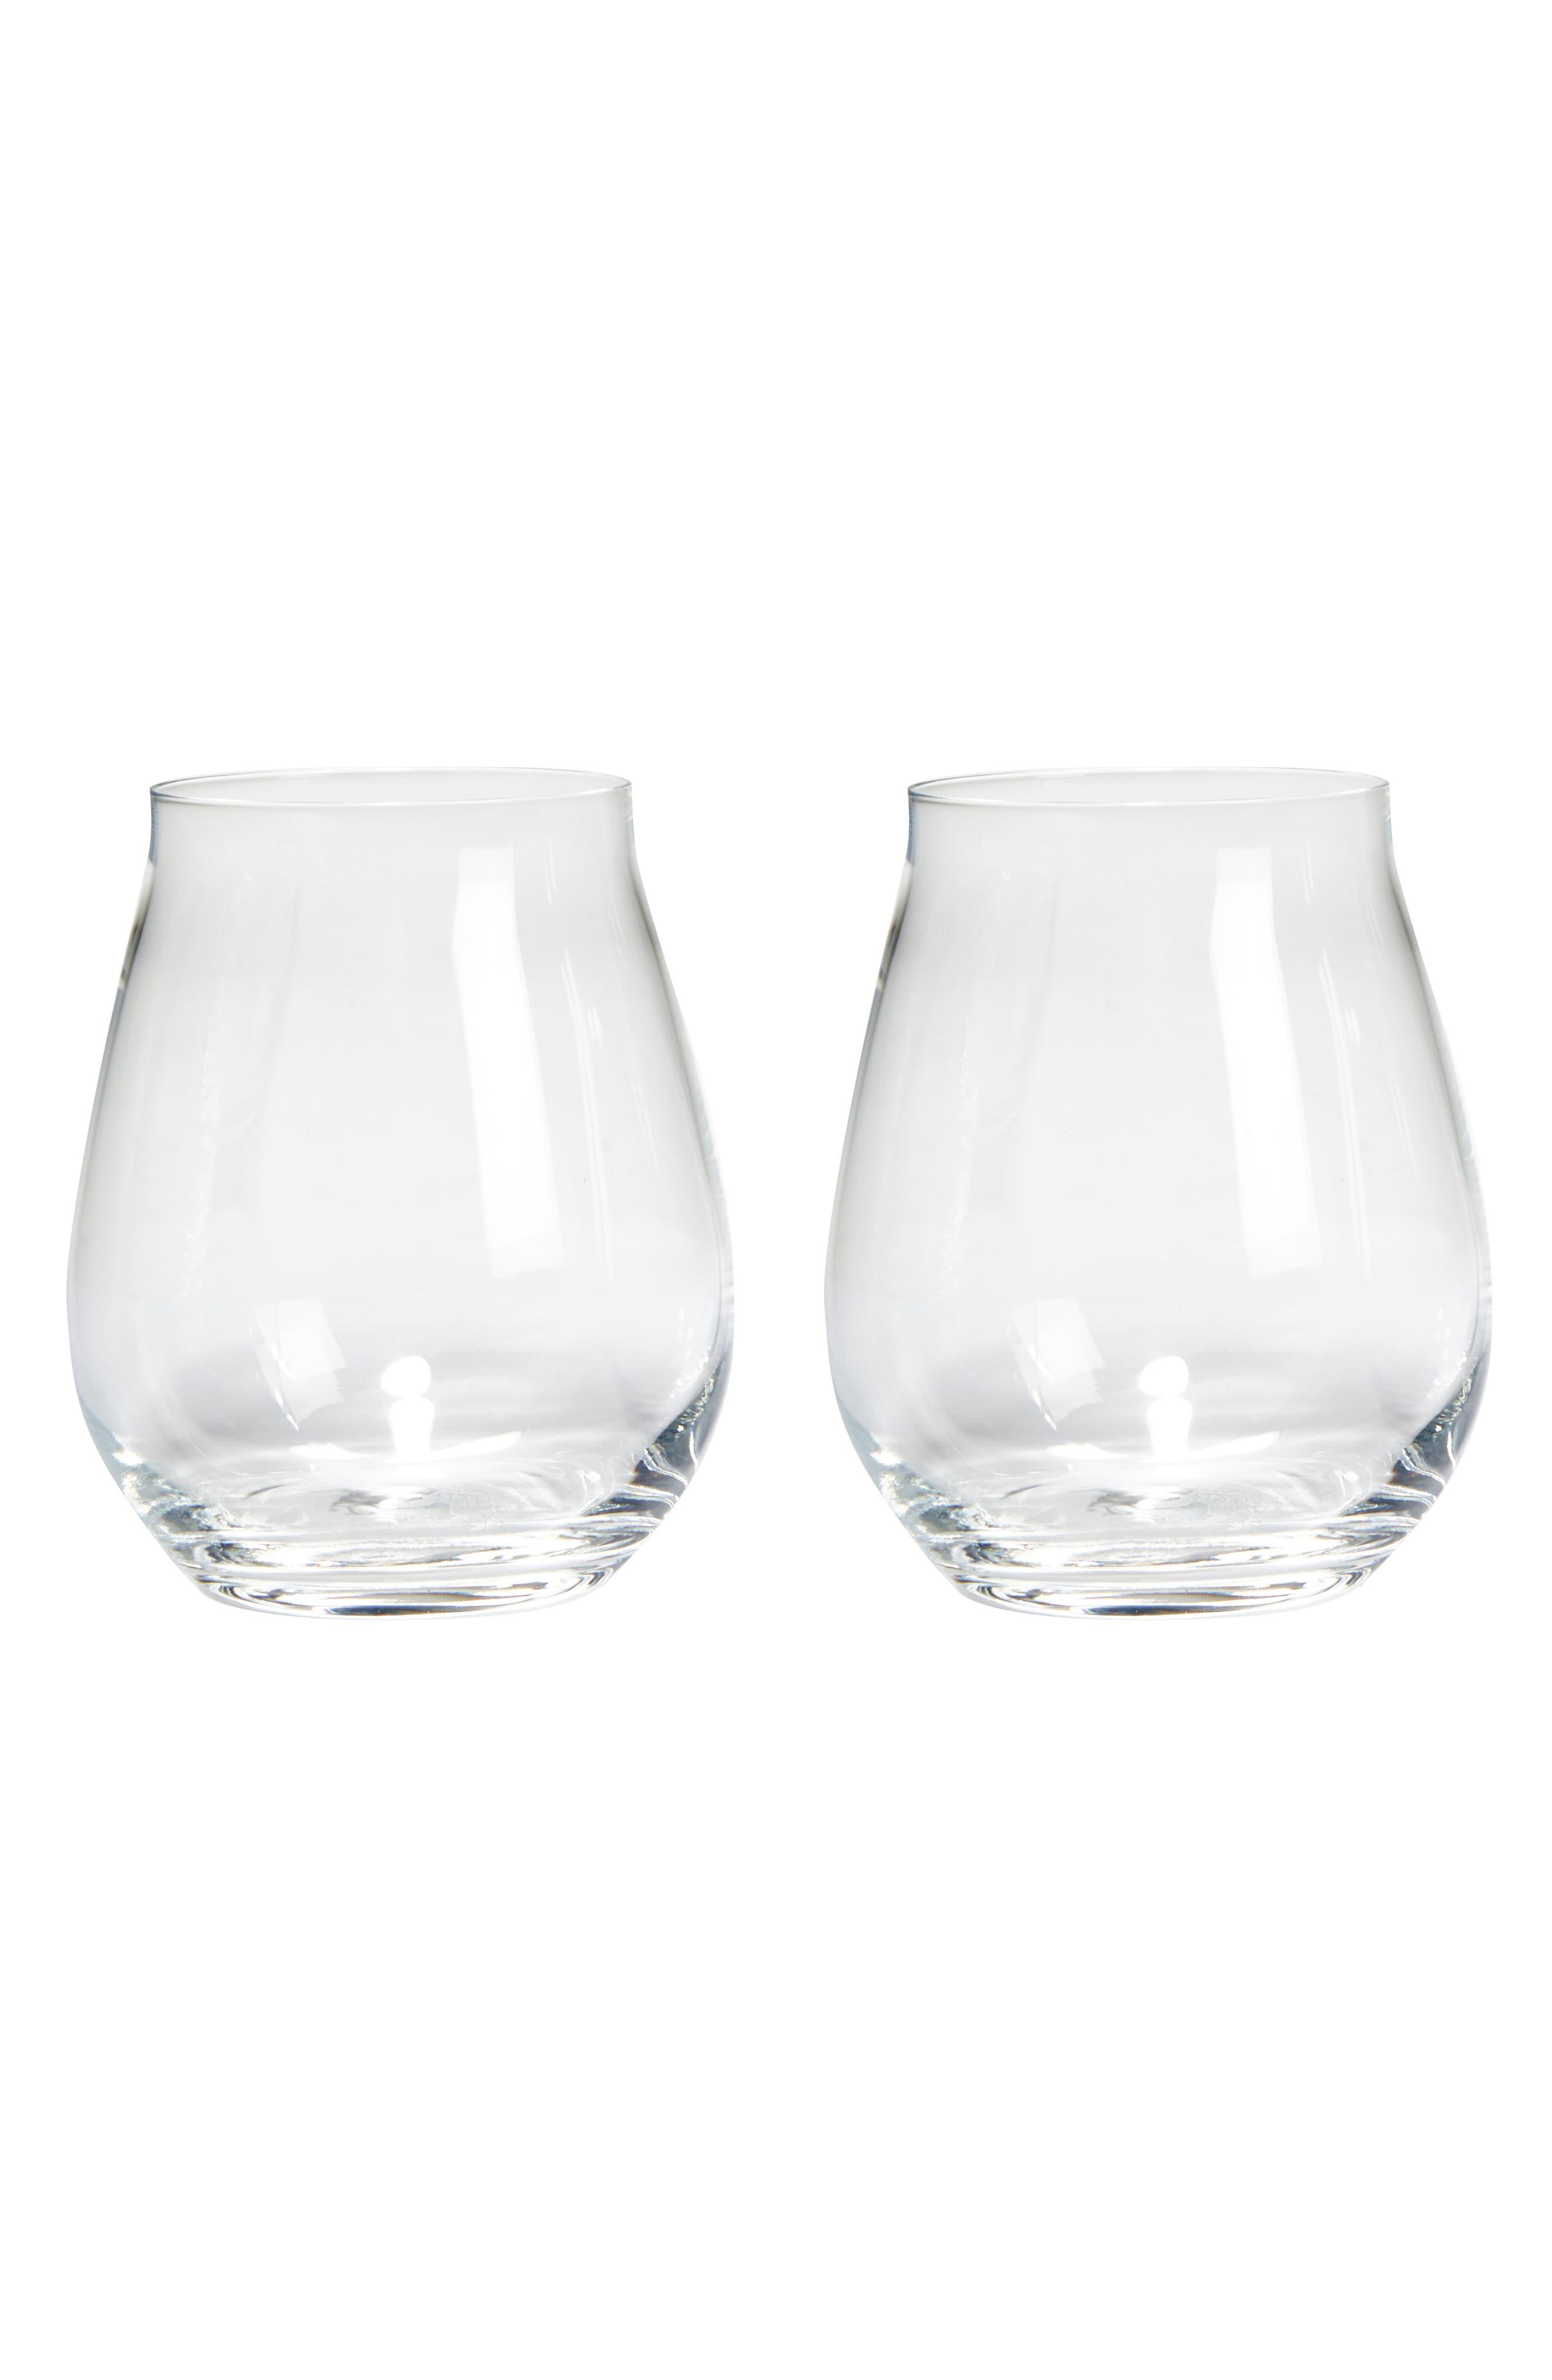 Luigi Bormiolo Vinea Trebbiano Set of 2 Stemless Wine Glasses